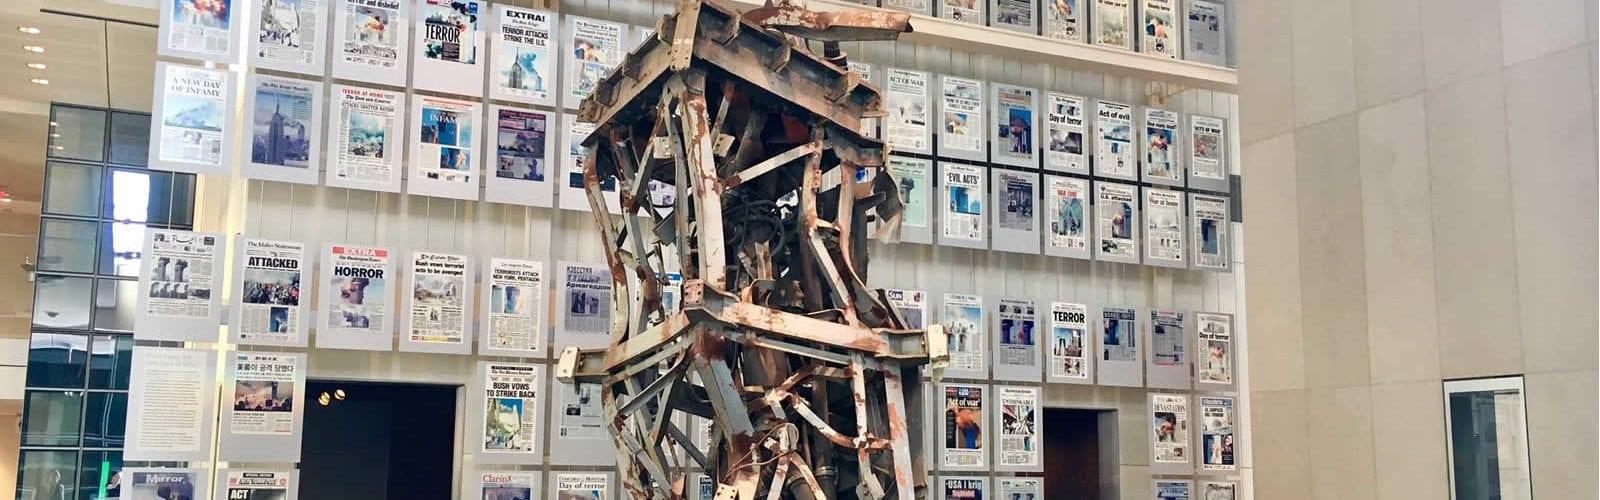 newseum-institute-musee-journalisme-libertes-une